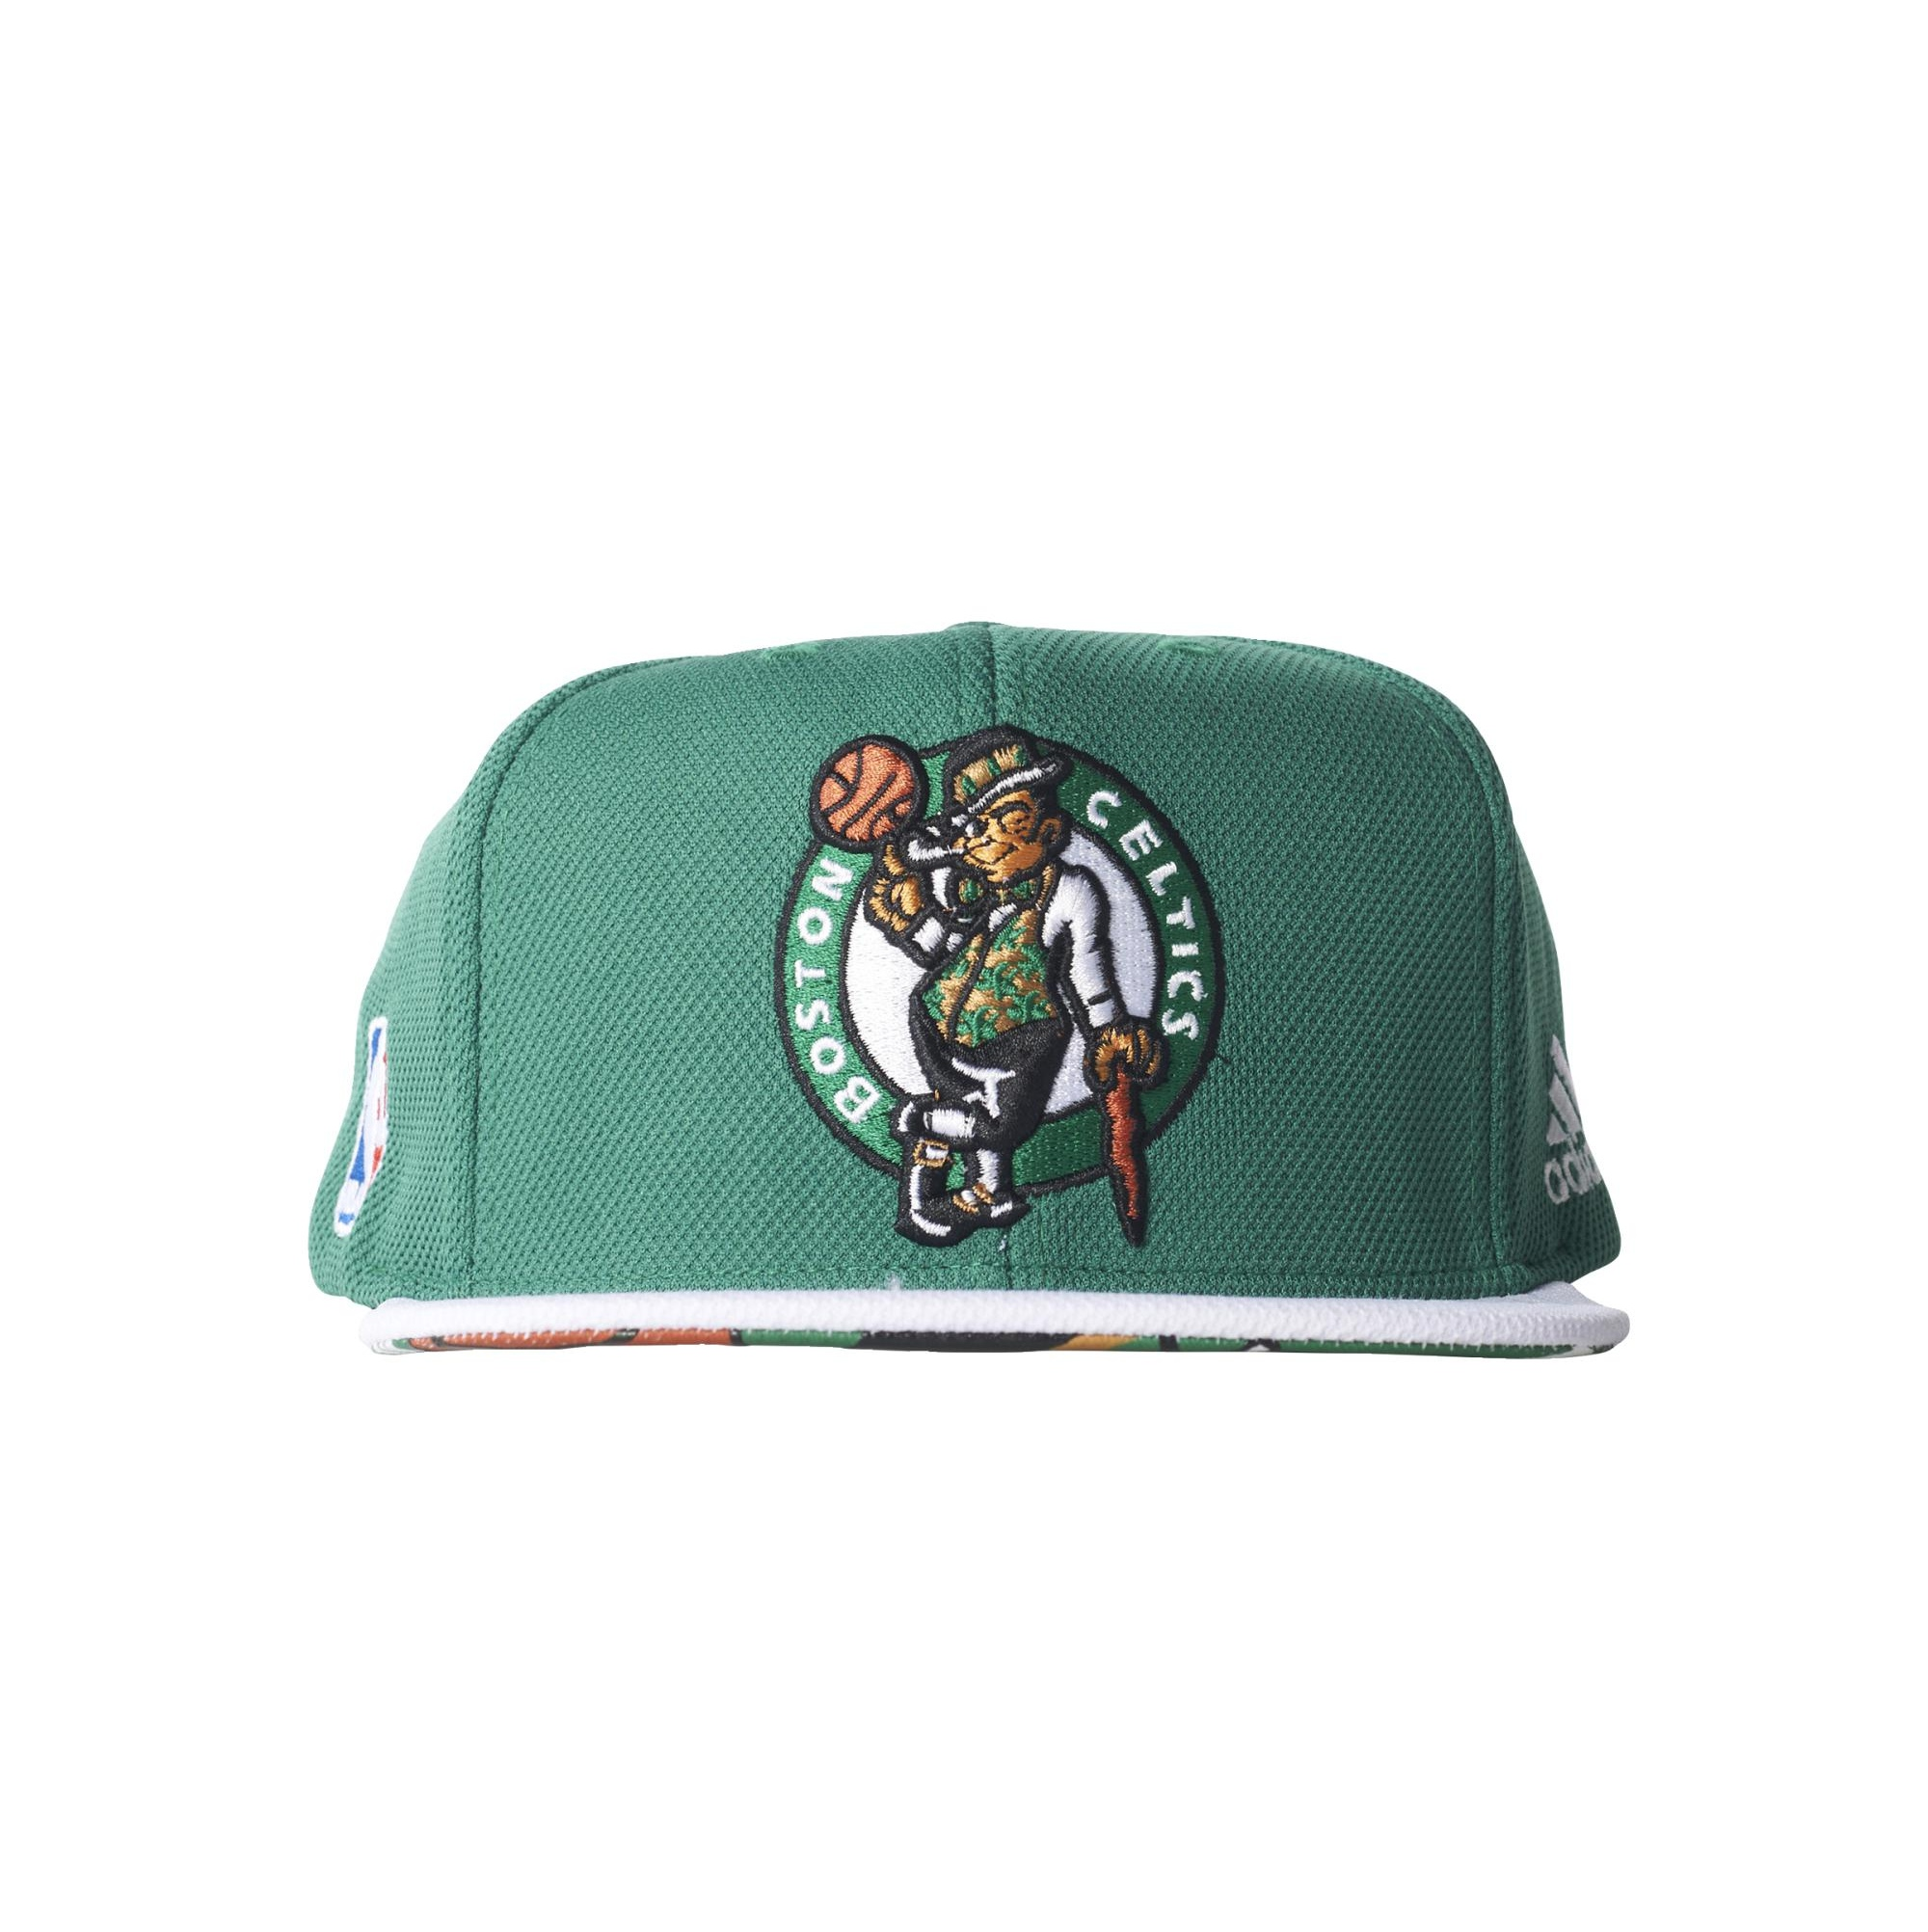 e67a4d713a519 Adidas NBA Gorra Flat Cap Celtics (verde blanco negro)